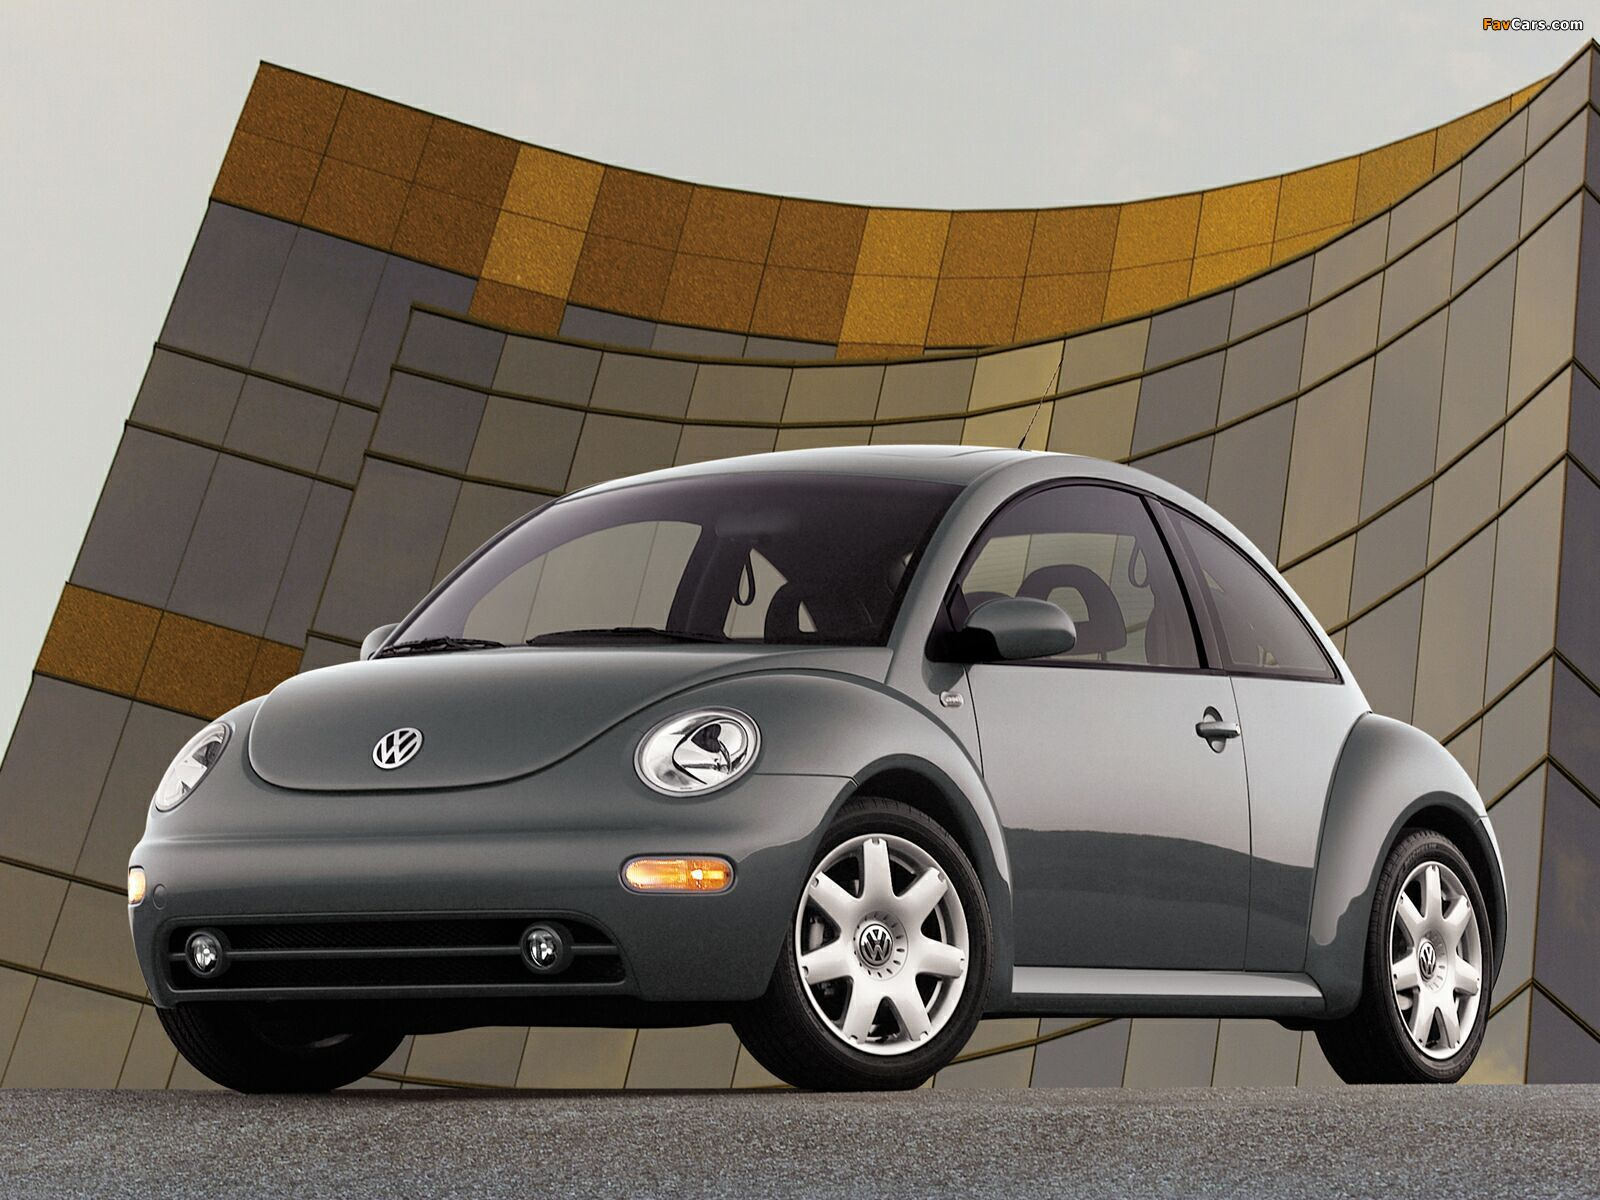 Images of vw beetles